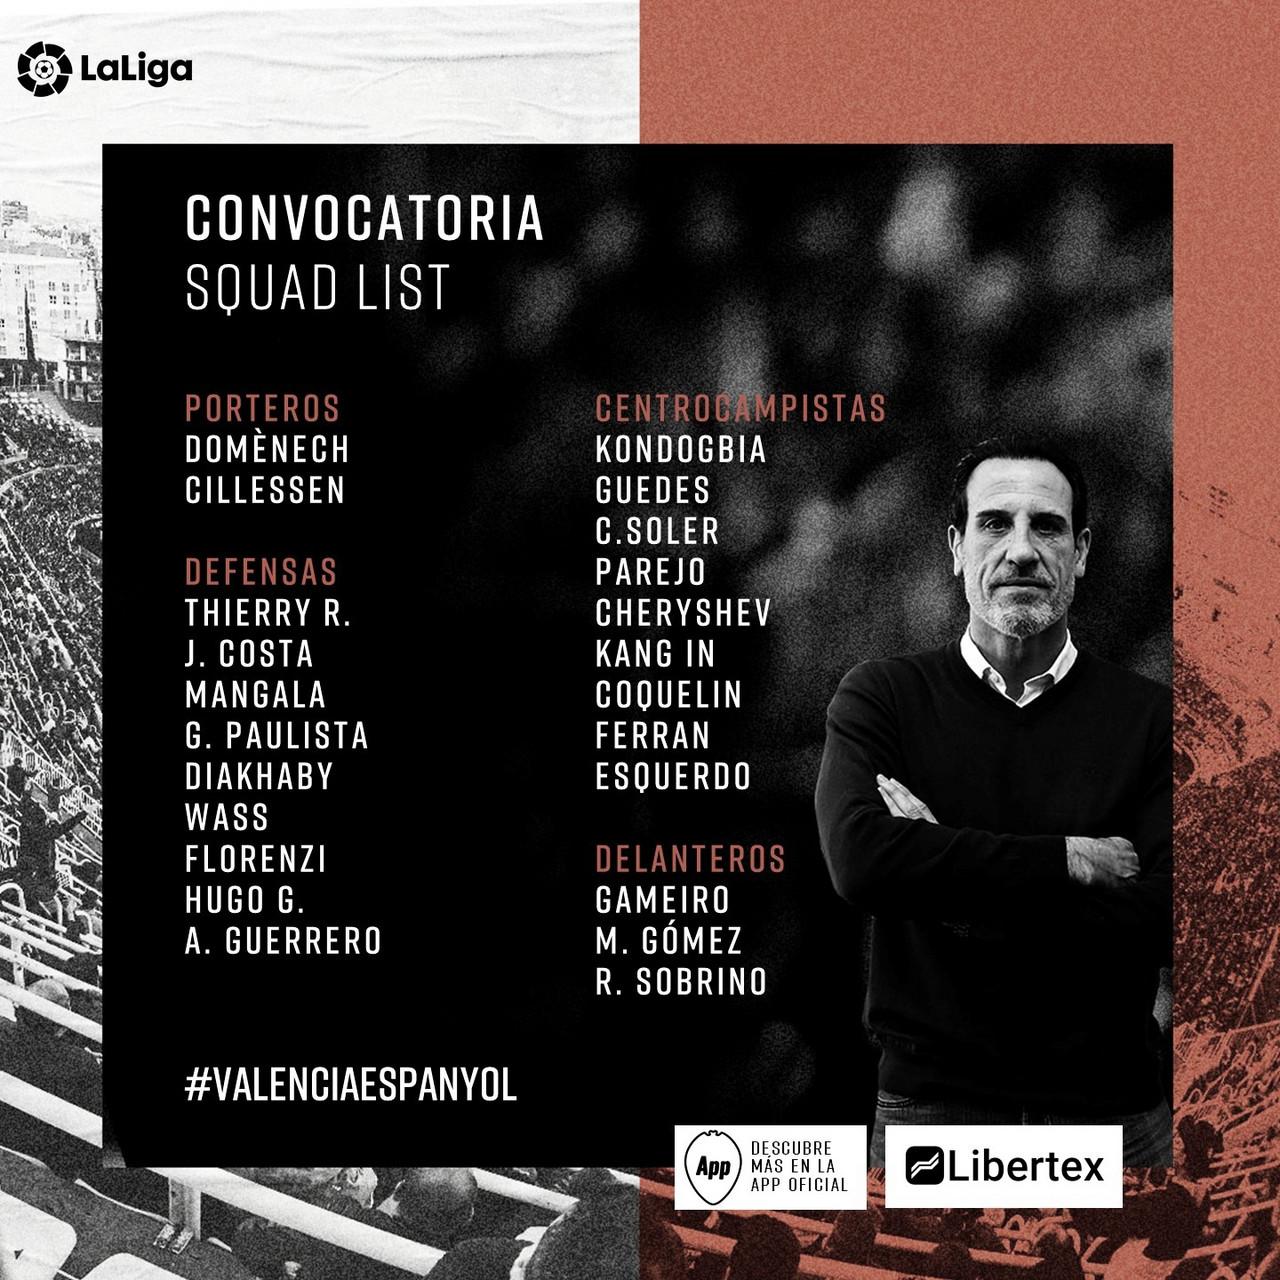 Convocatoria del Valencia CF frente al RCDE Espanyol